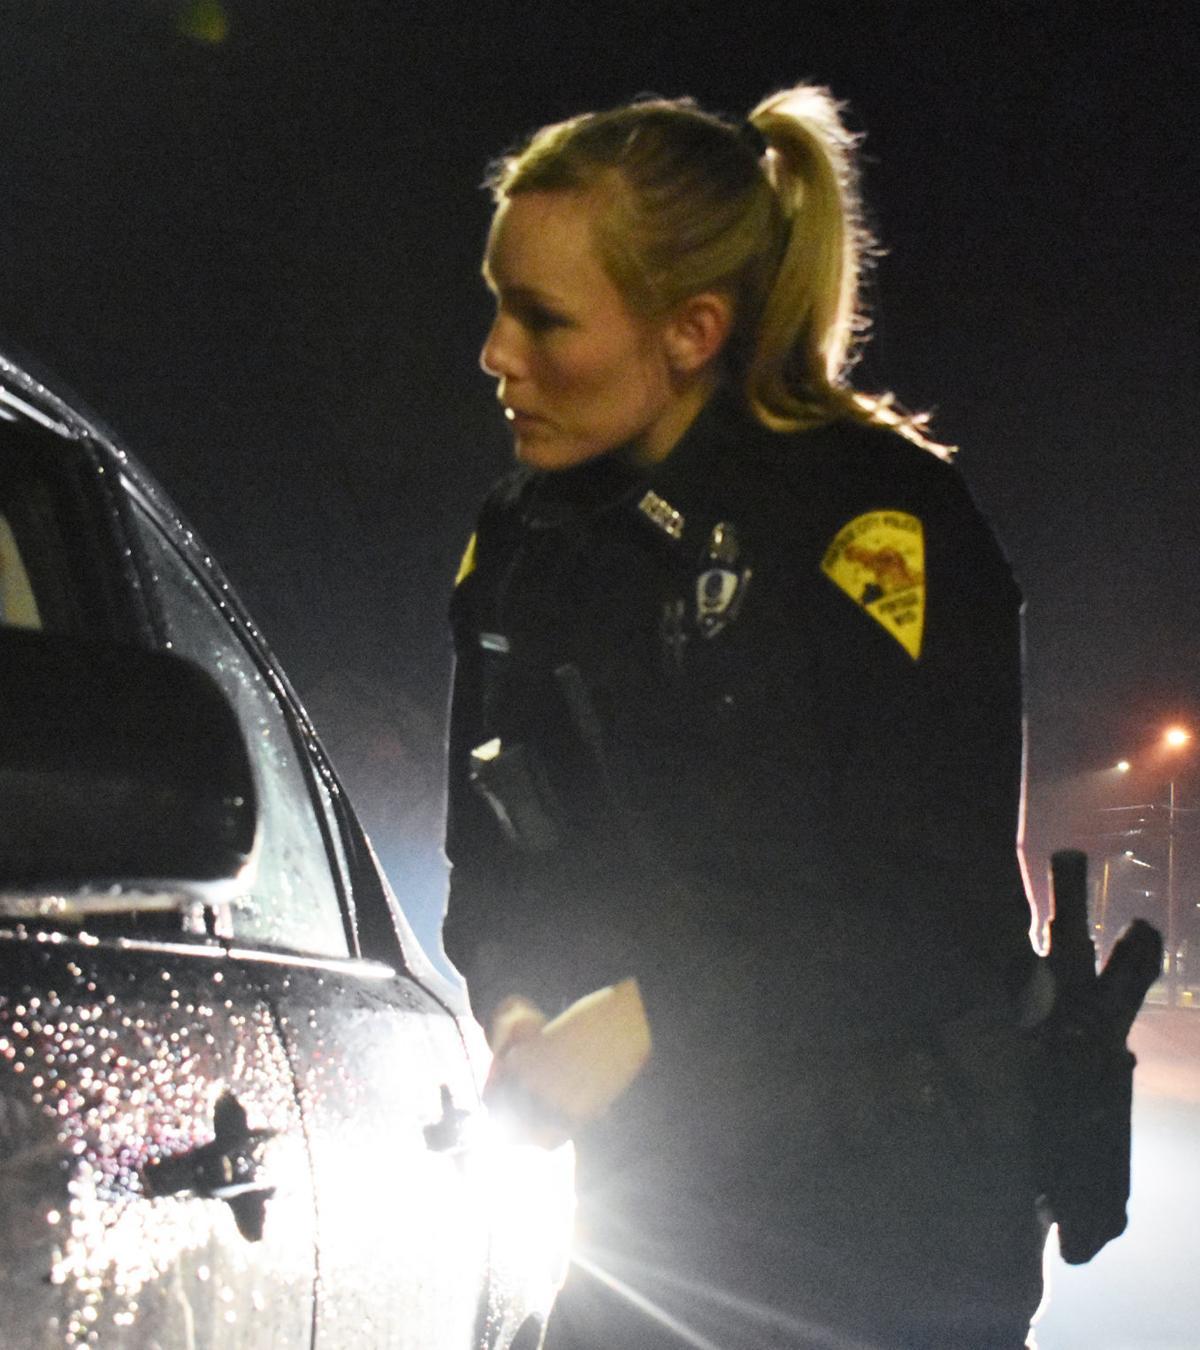 Officer Heather Medina in traffic stop